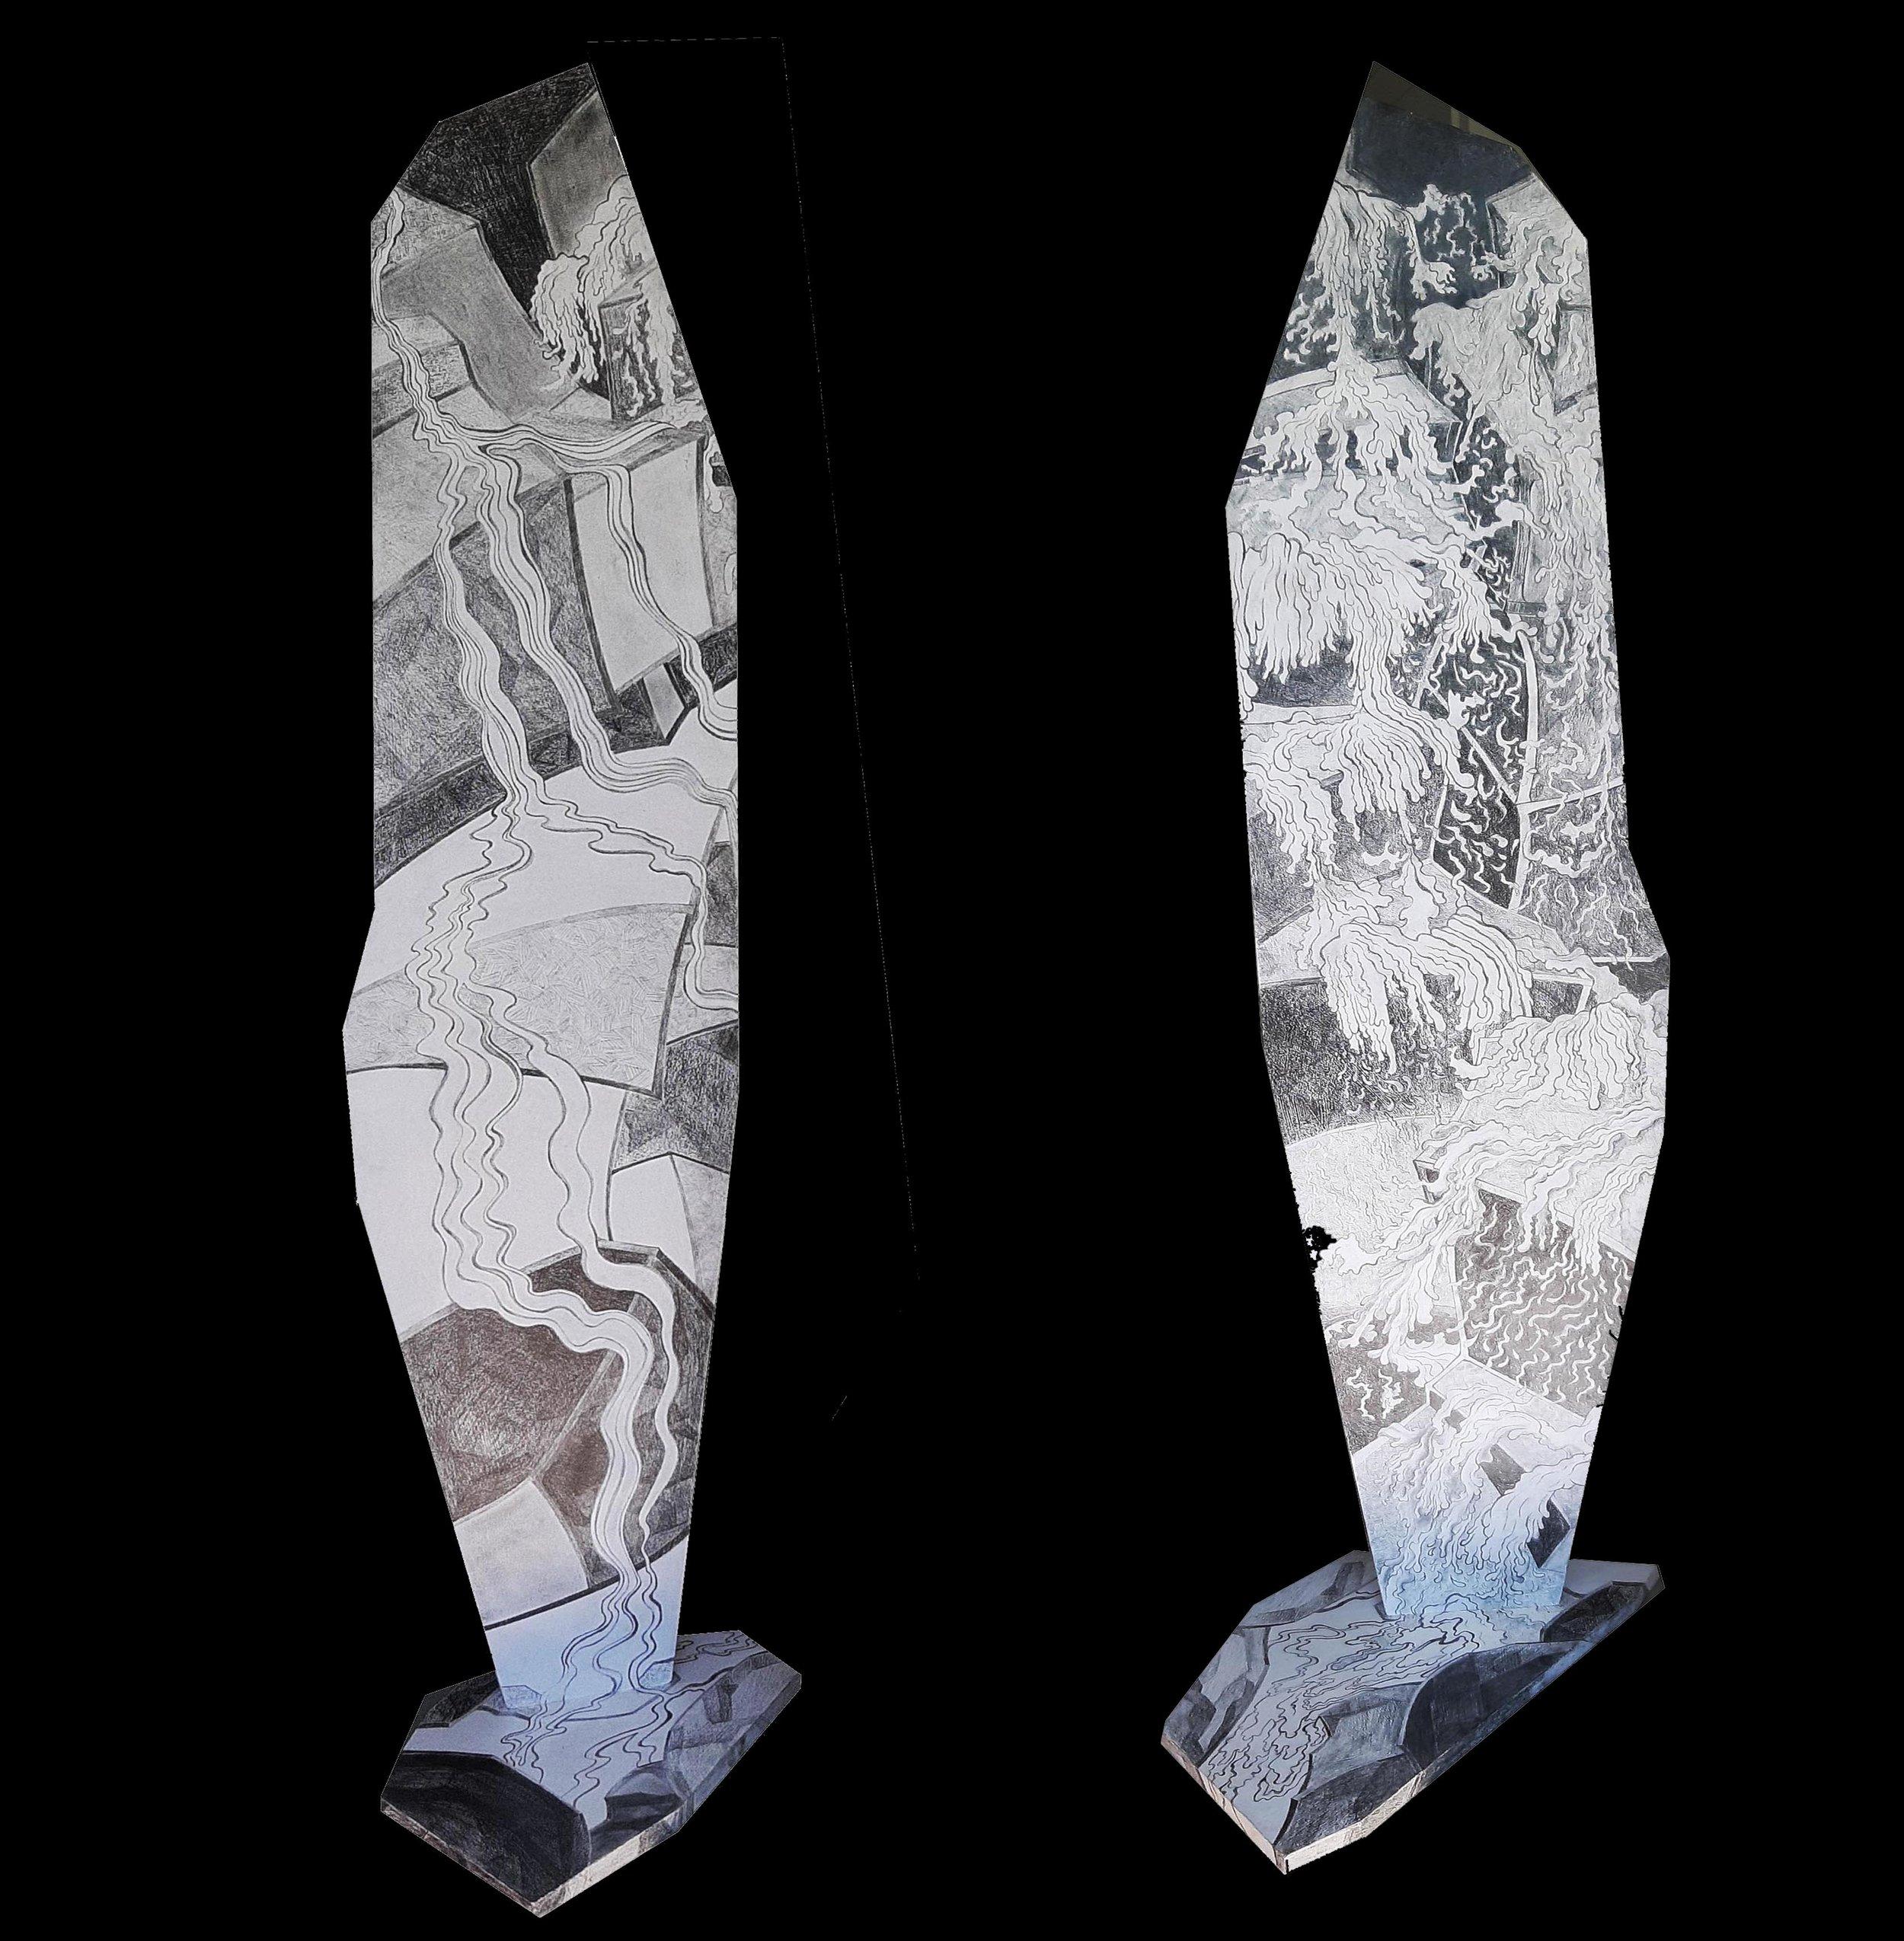 Gimel Les Cascades IV, 2018,Graphite on MDF, 123 cm x 56 cm x 23.5 cm